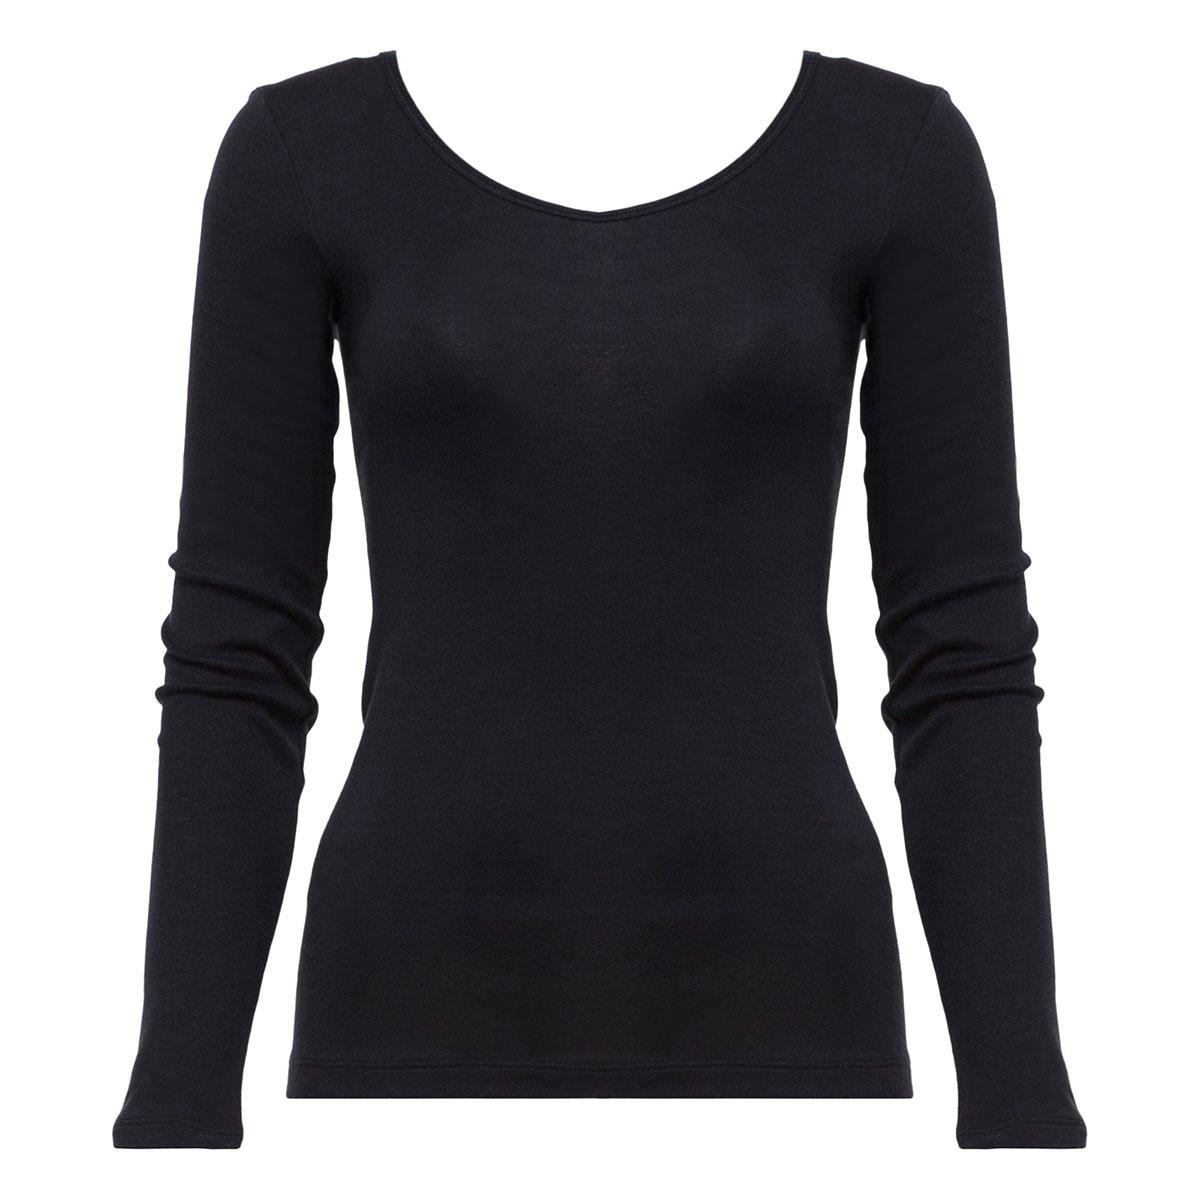 Top manches longues noir - Cotton Liberty-PLAYTEX